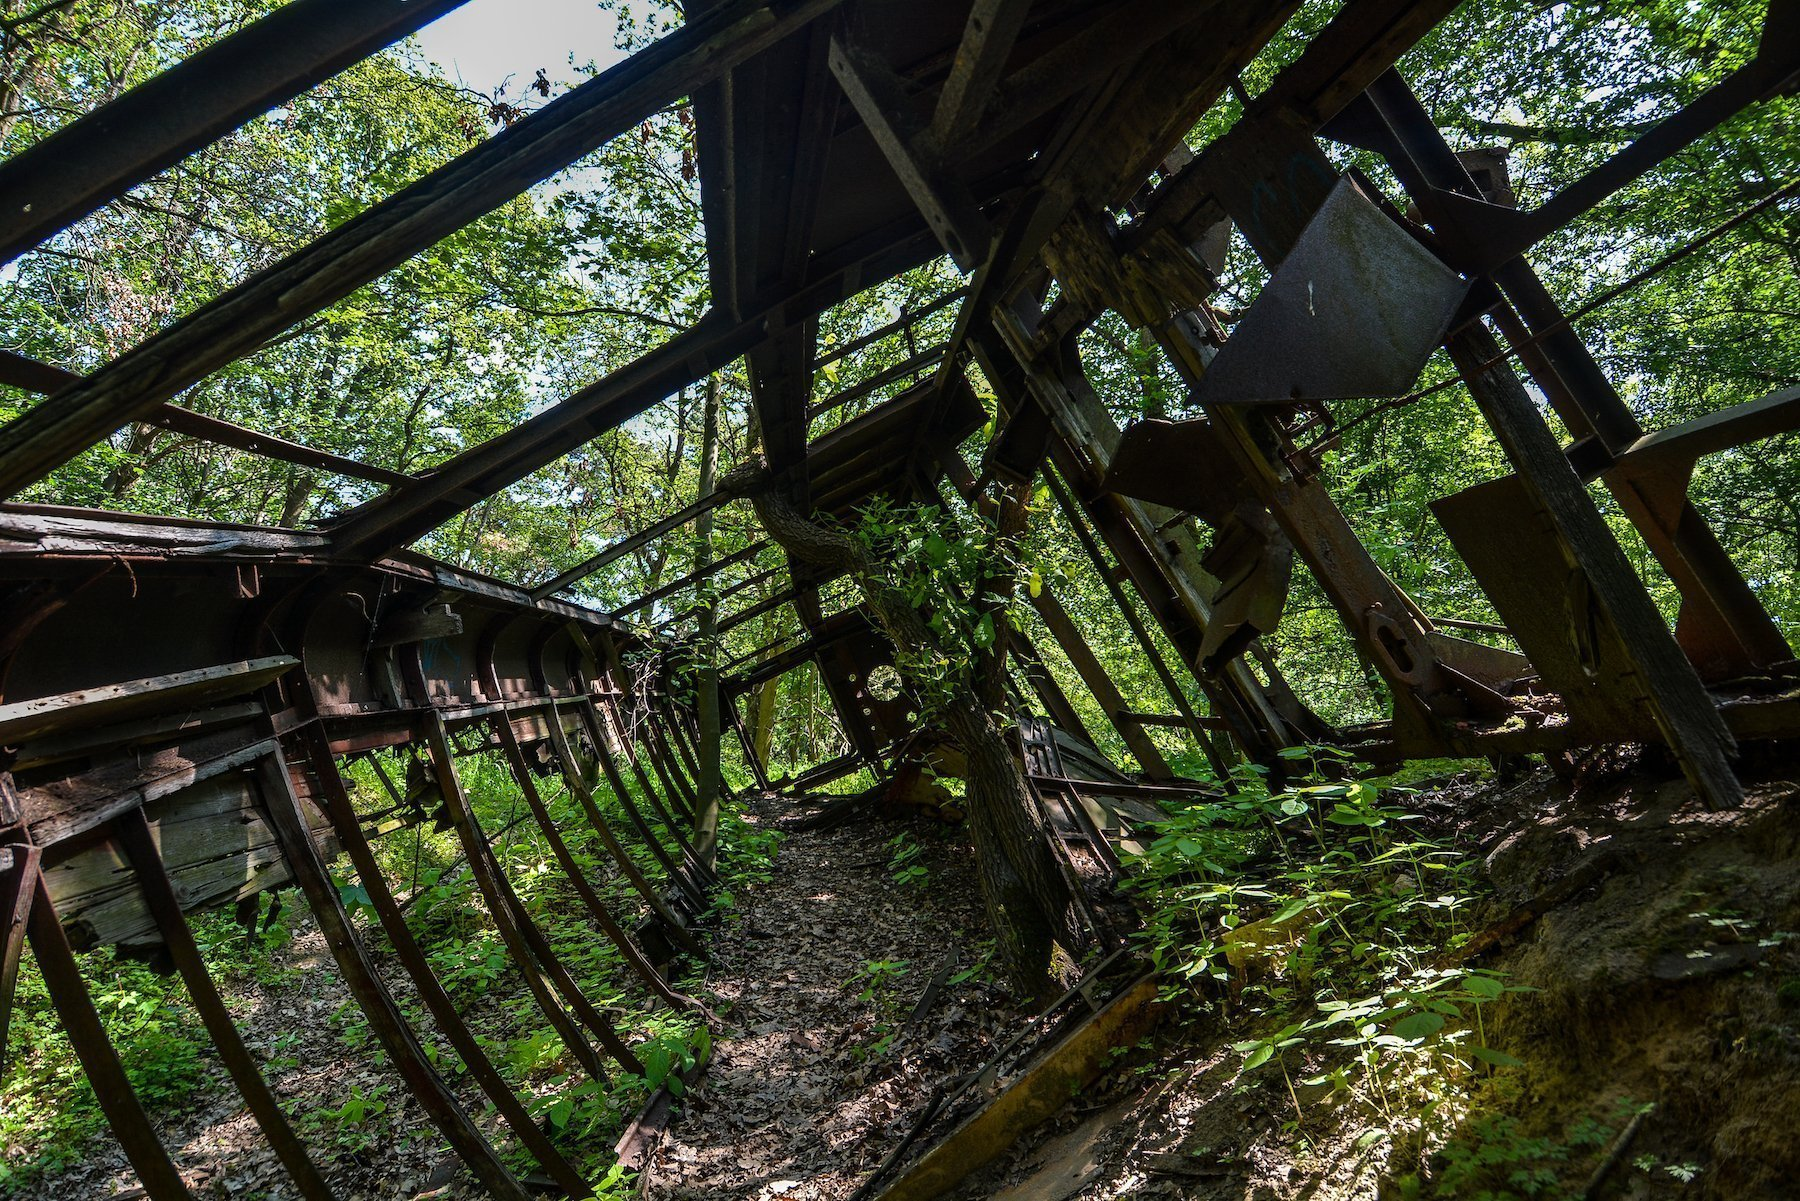 inside abandoned tram strassenbahn brandenburg dallgow doeberitz potsdam abandoned urbex lost places germany deutschland